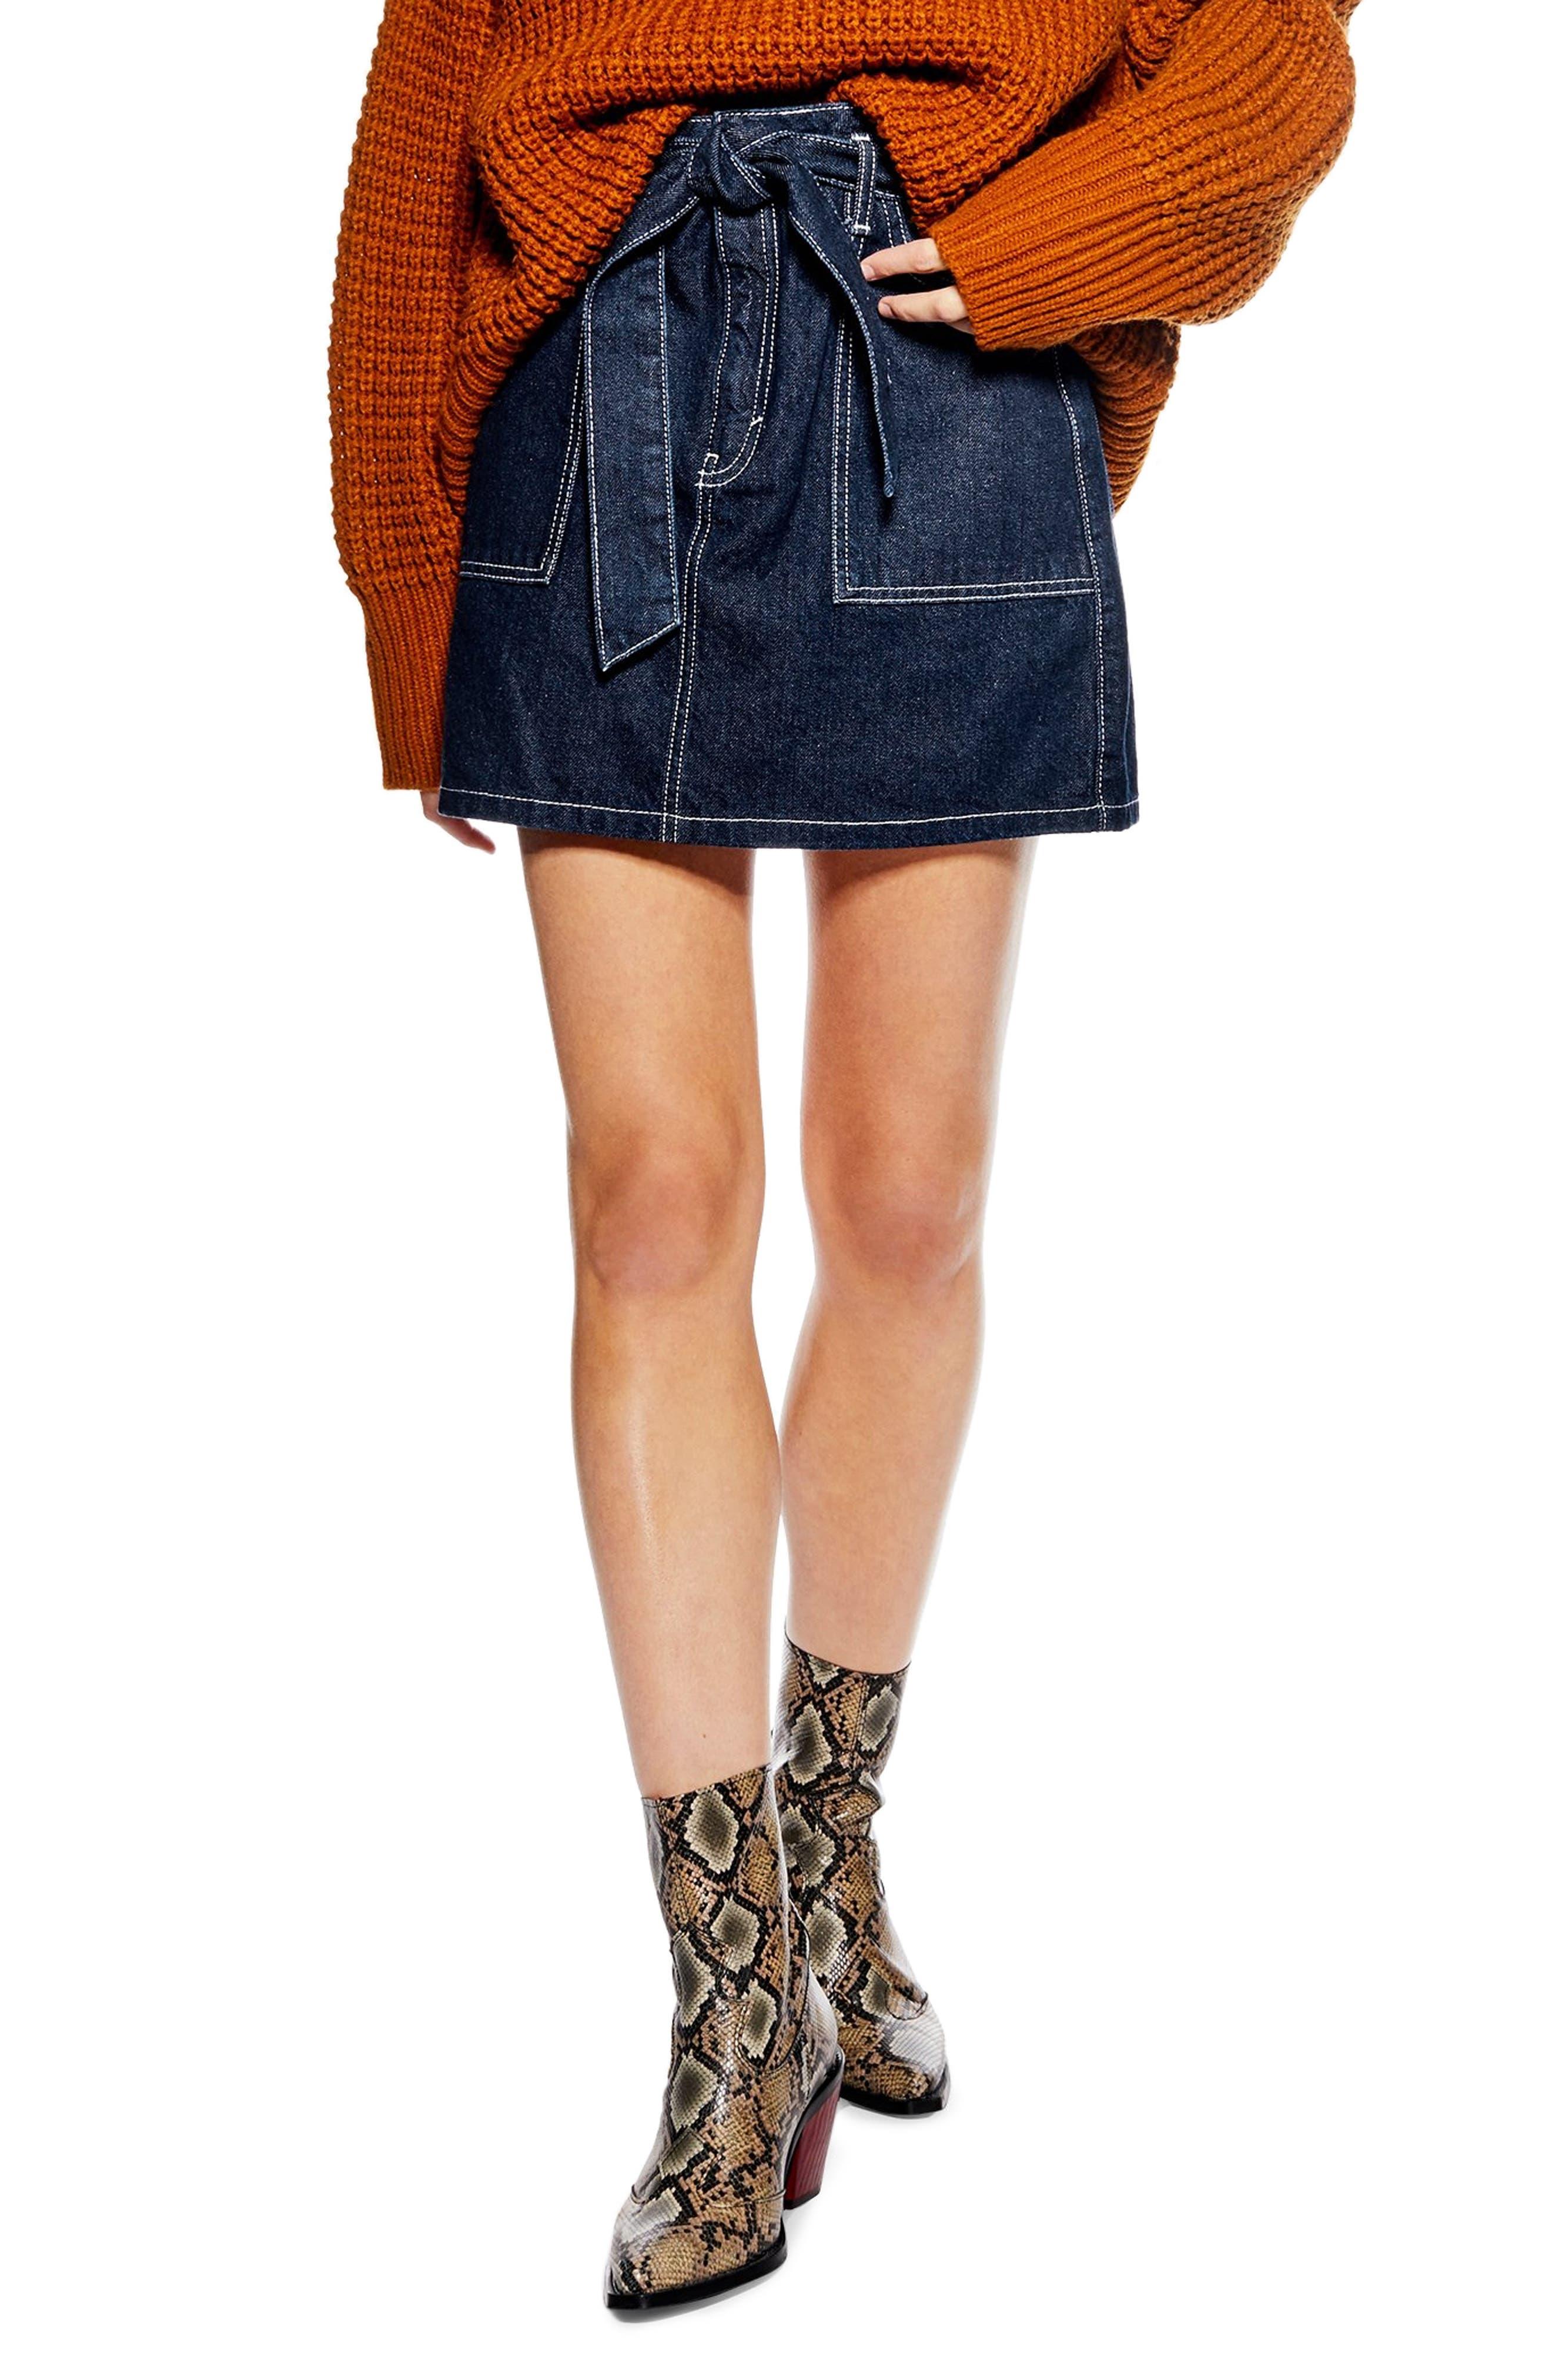 Topshop Belted Utility Skirt, US (fits like 0) - Blue